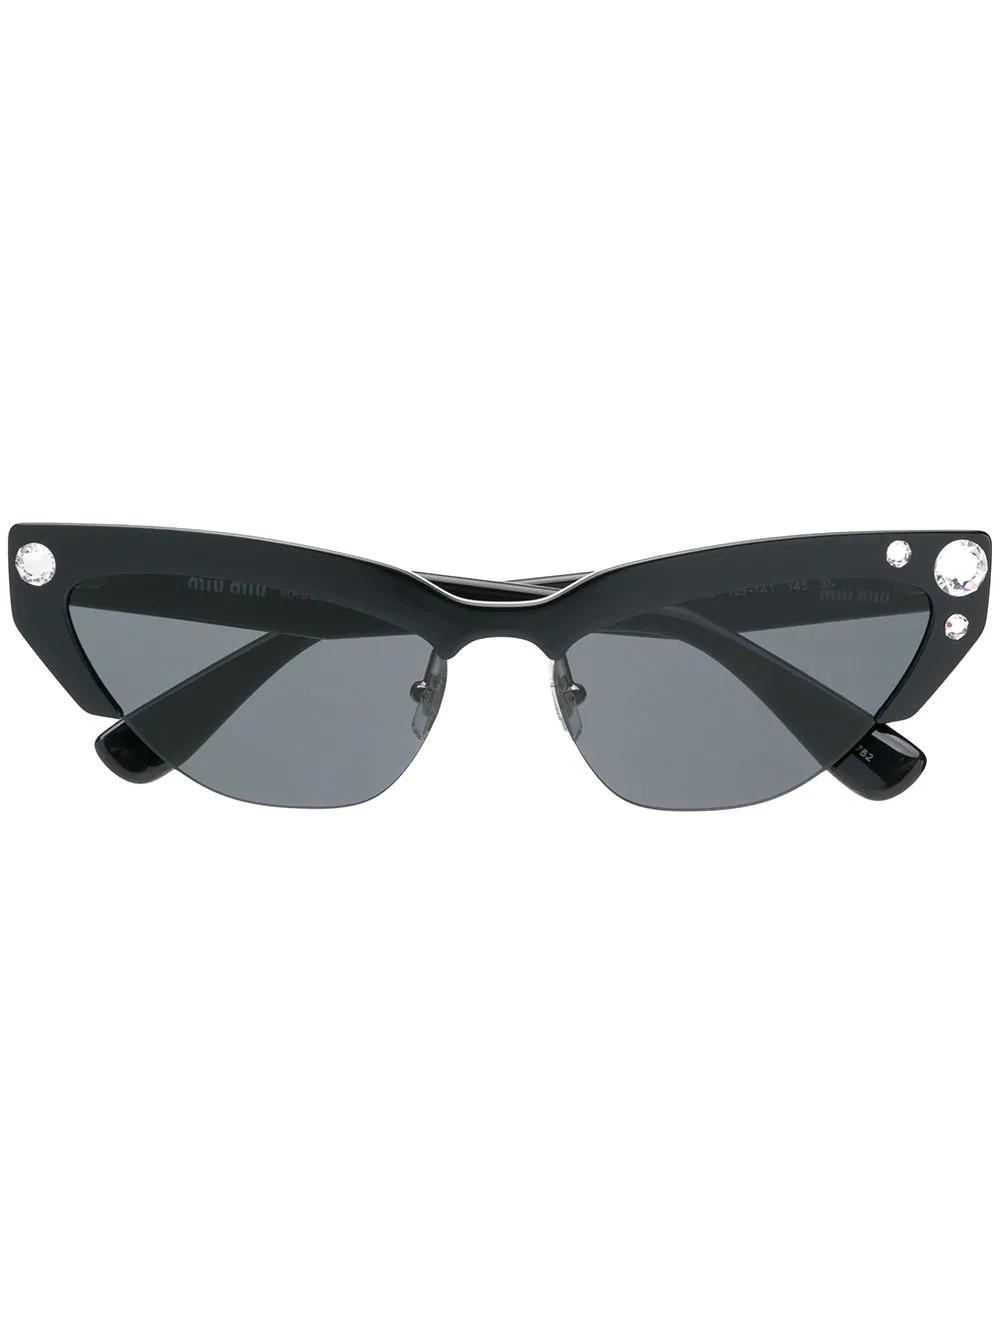 06943d7a11b Miu Miu Eyewear Smu04U Sunglasses - Black